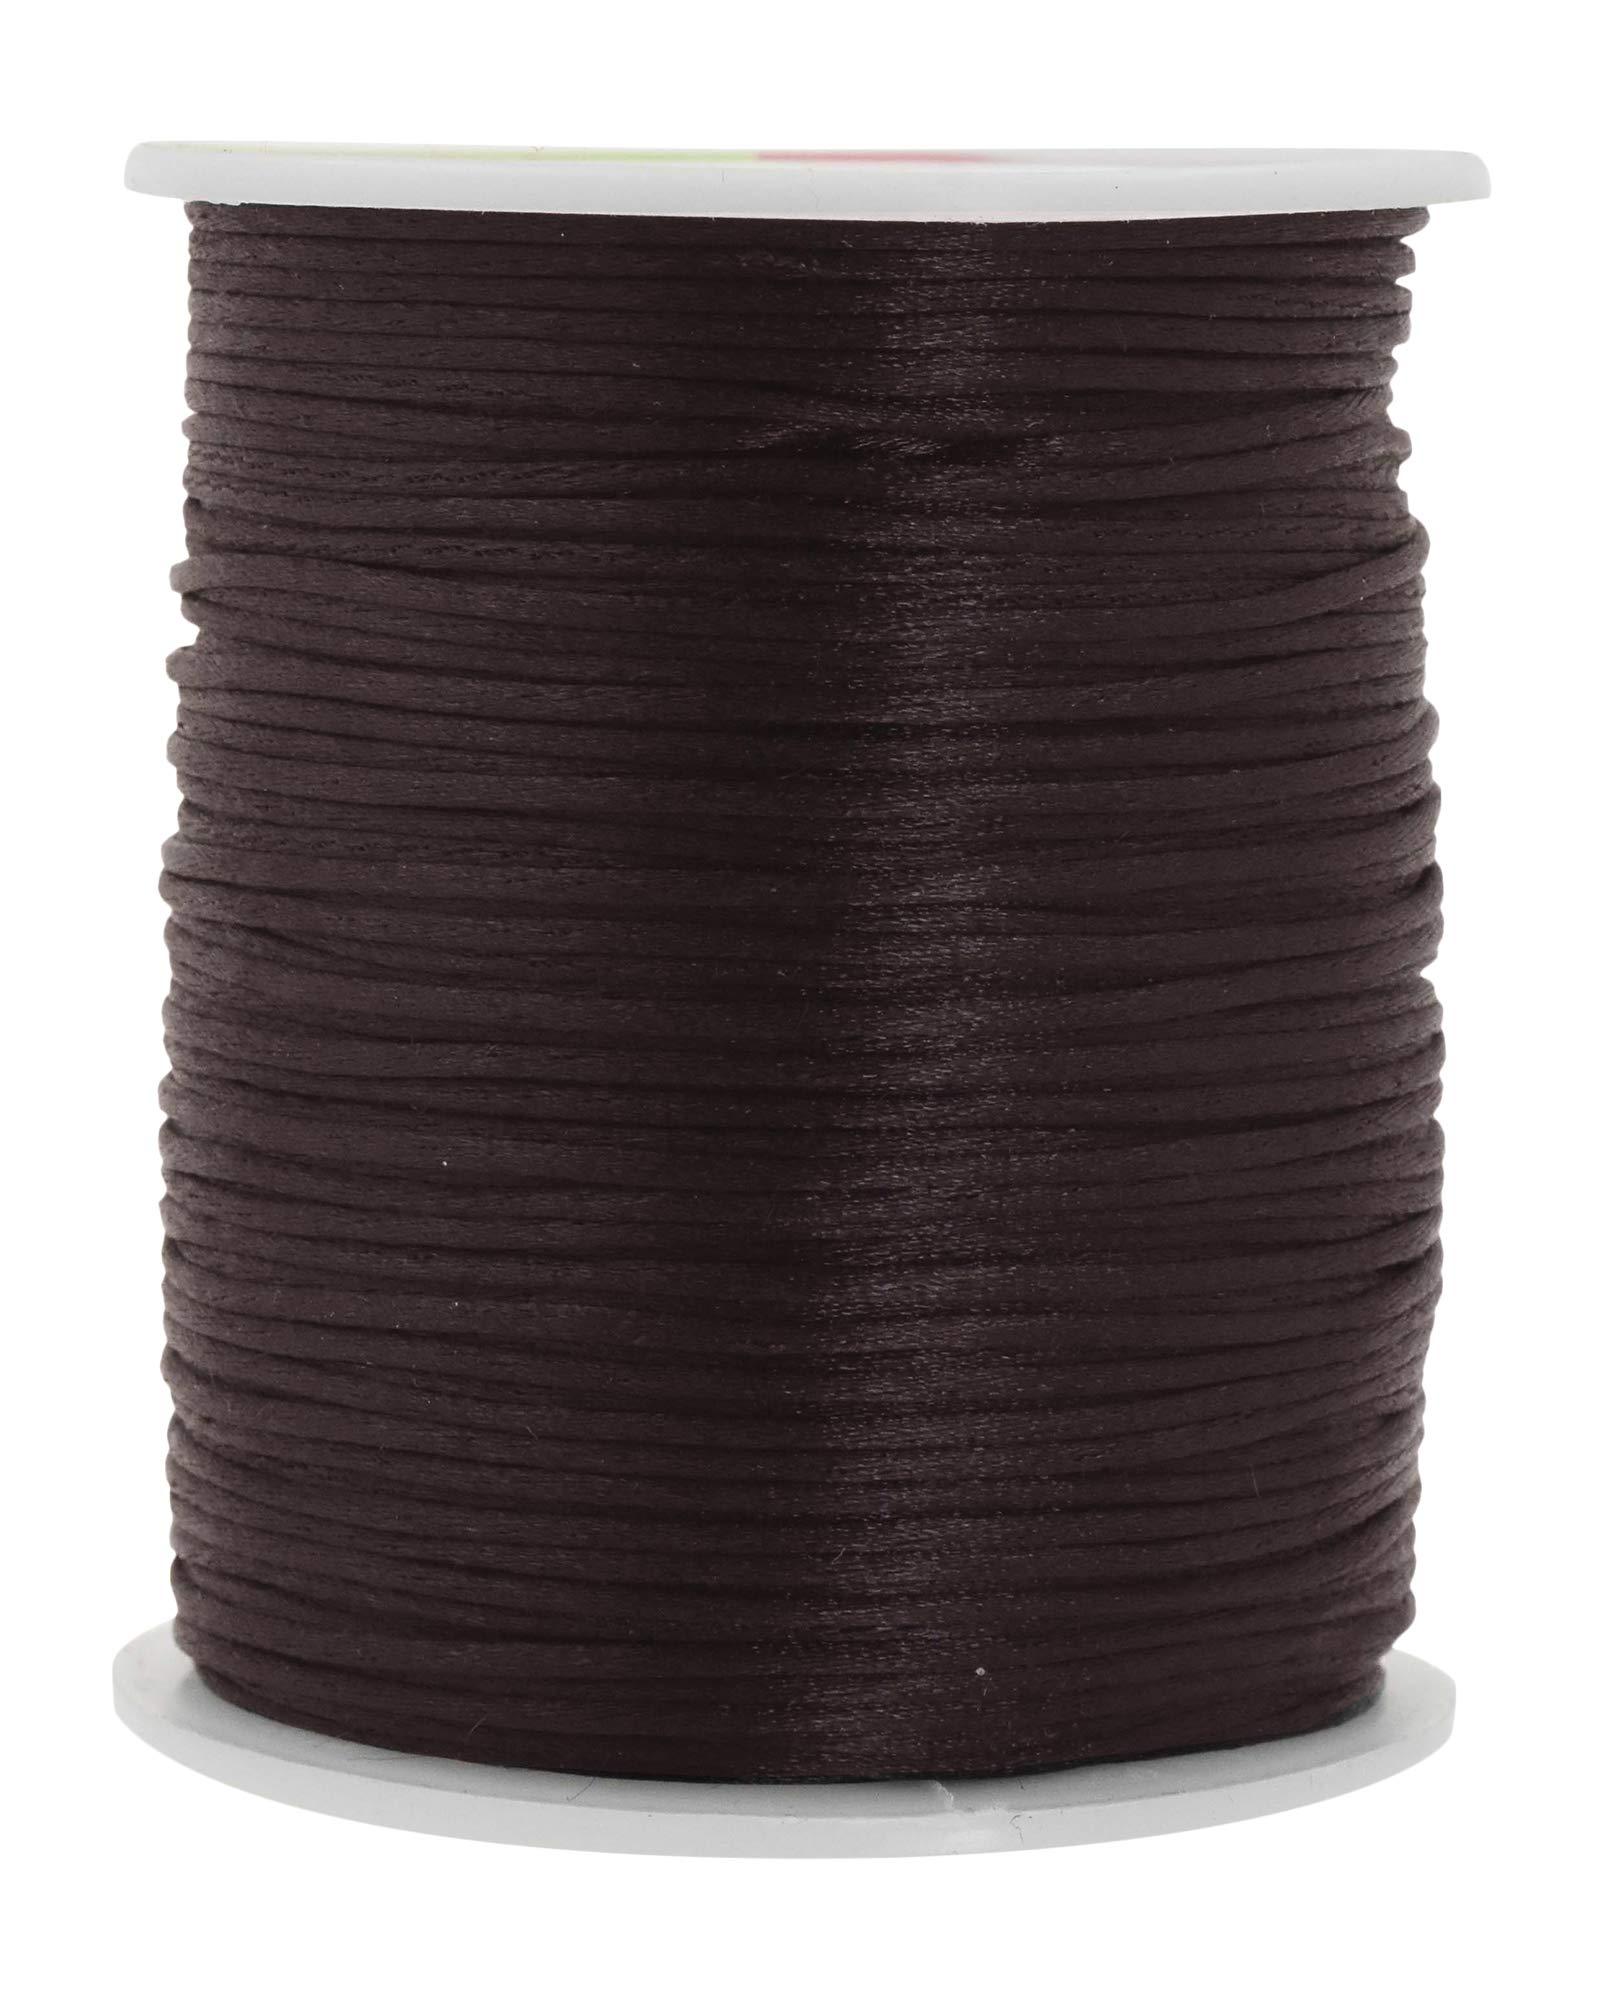 Mandala Crafts Satin Rattail Cord String from Nylon for Chinese Knot, Macramé, Trim, Jewelry Making (Dark Chocolate Brown, 1mm)